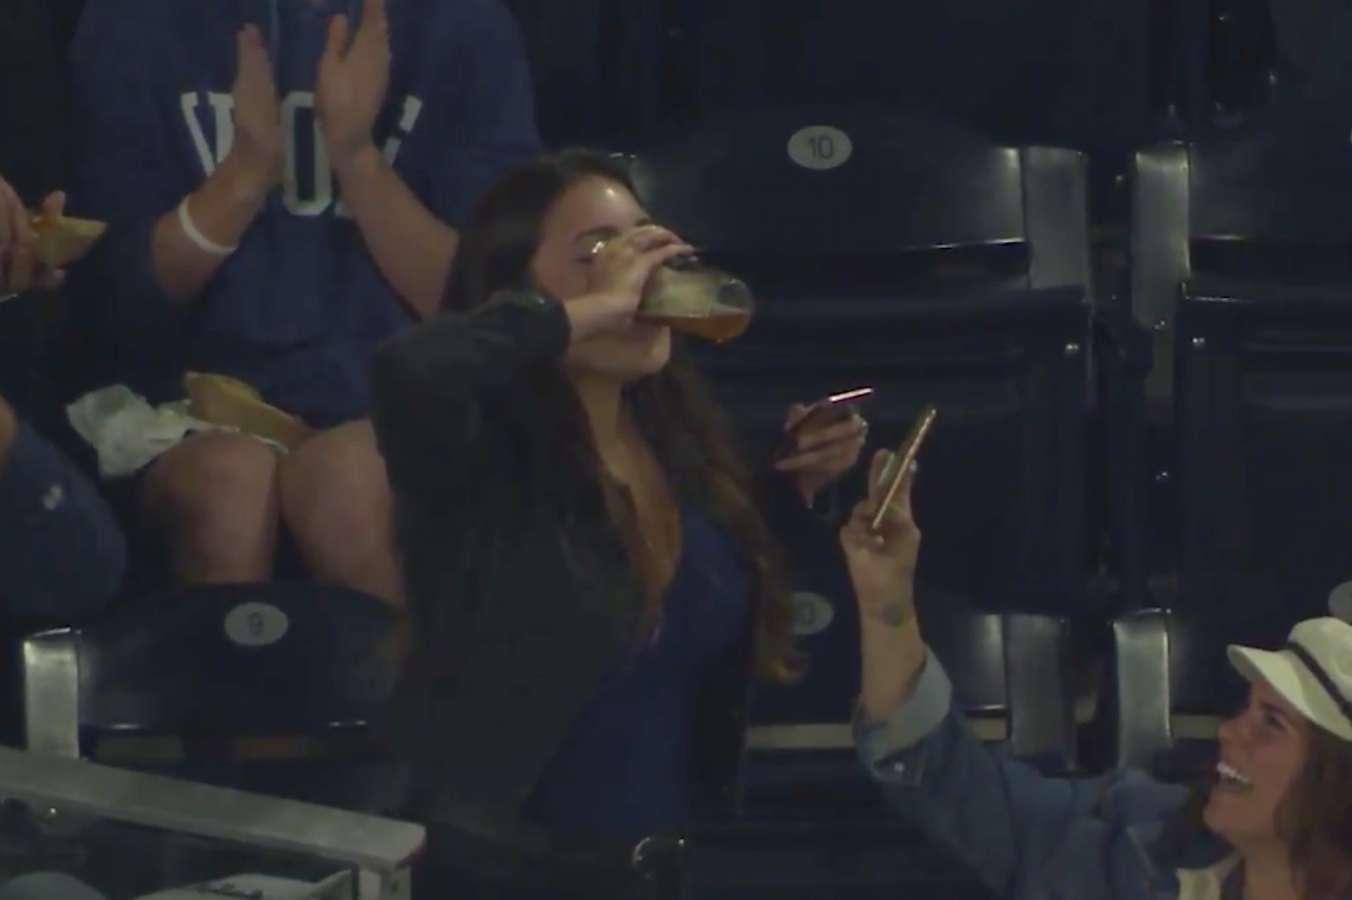 WATCH: Woman catches foul ball then skolls beer